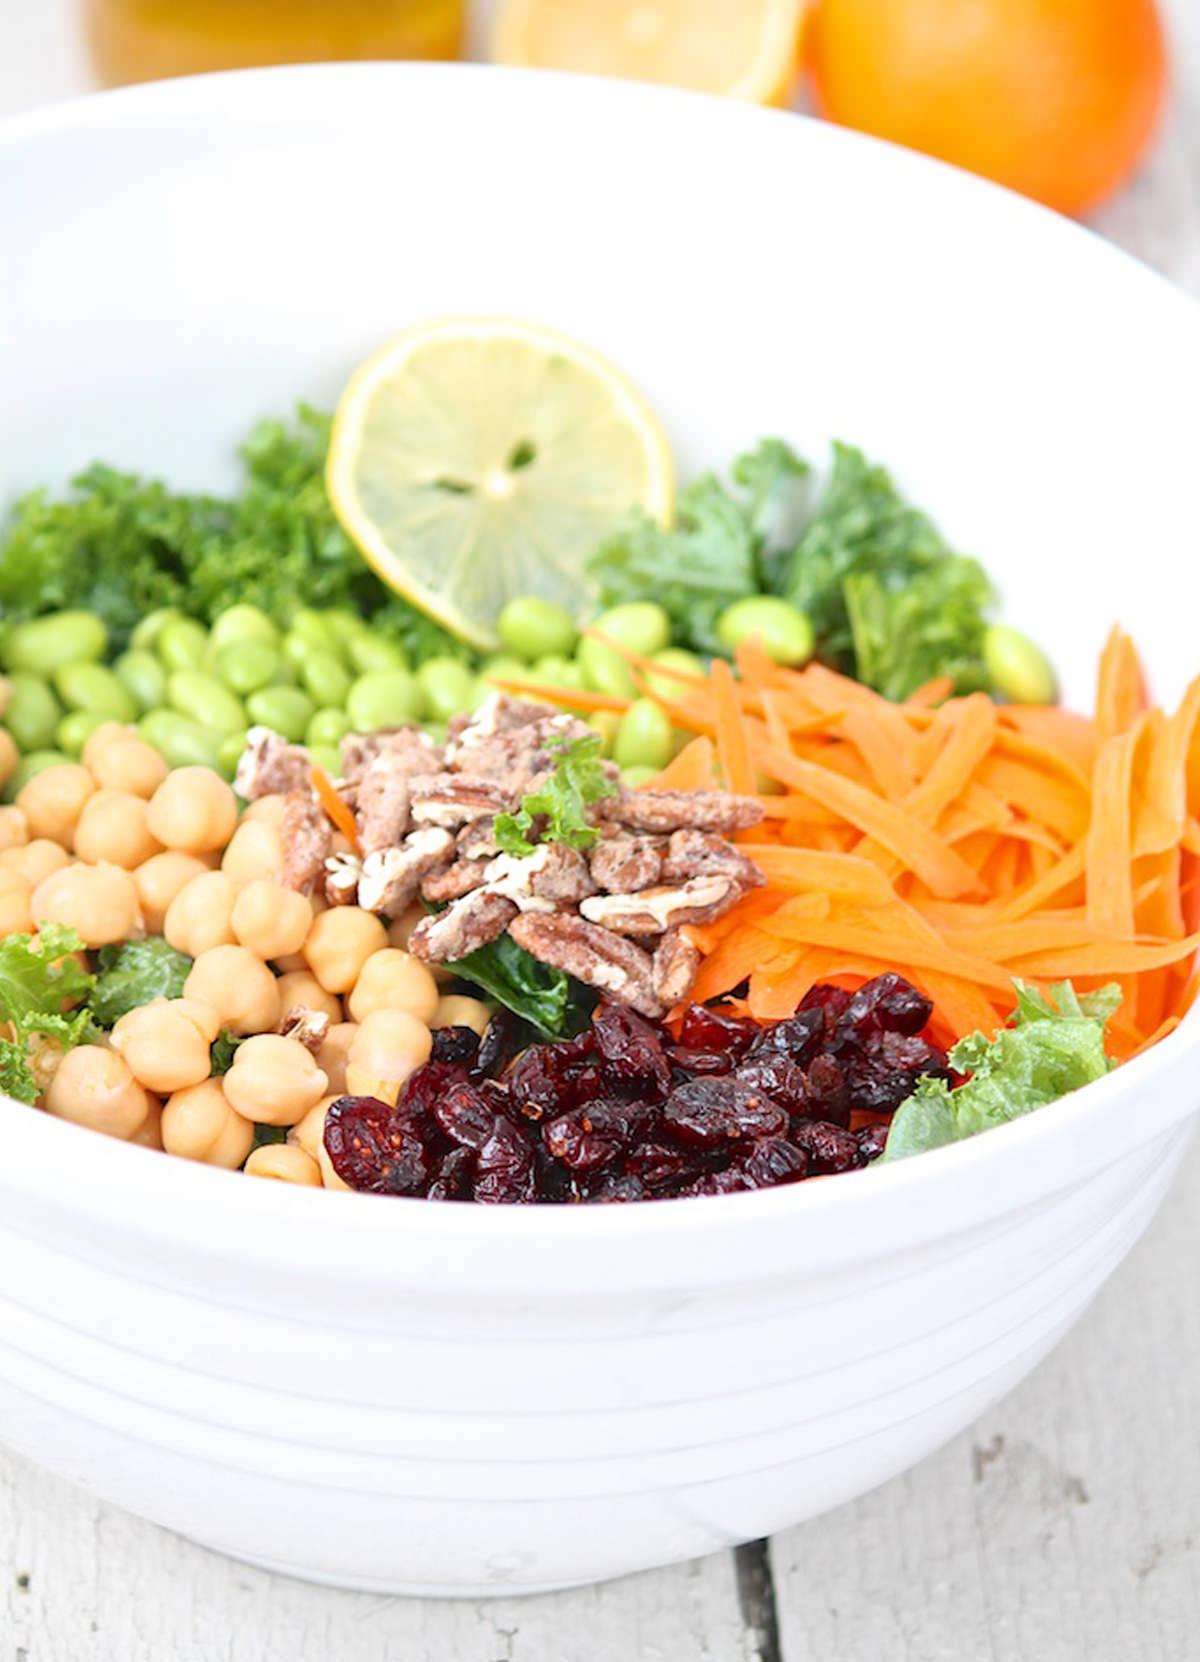 Chopped-Kale-Salad-With-Meyer-Lemon-Viniagrette